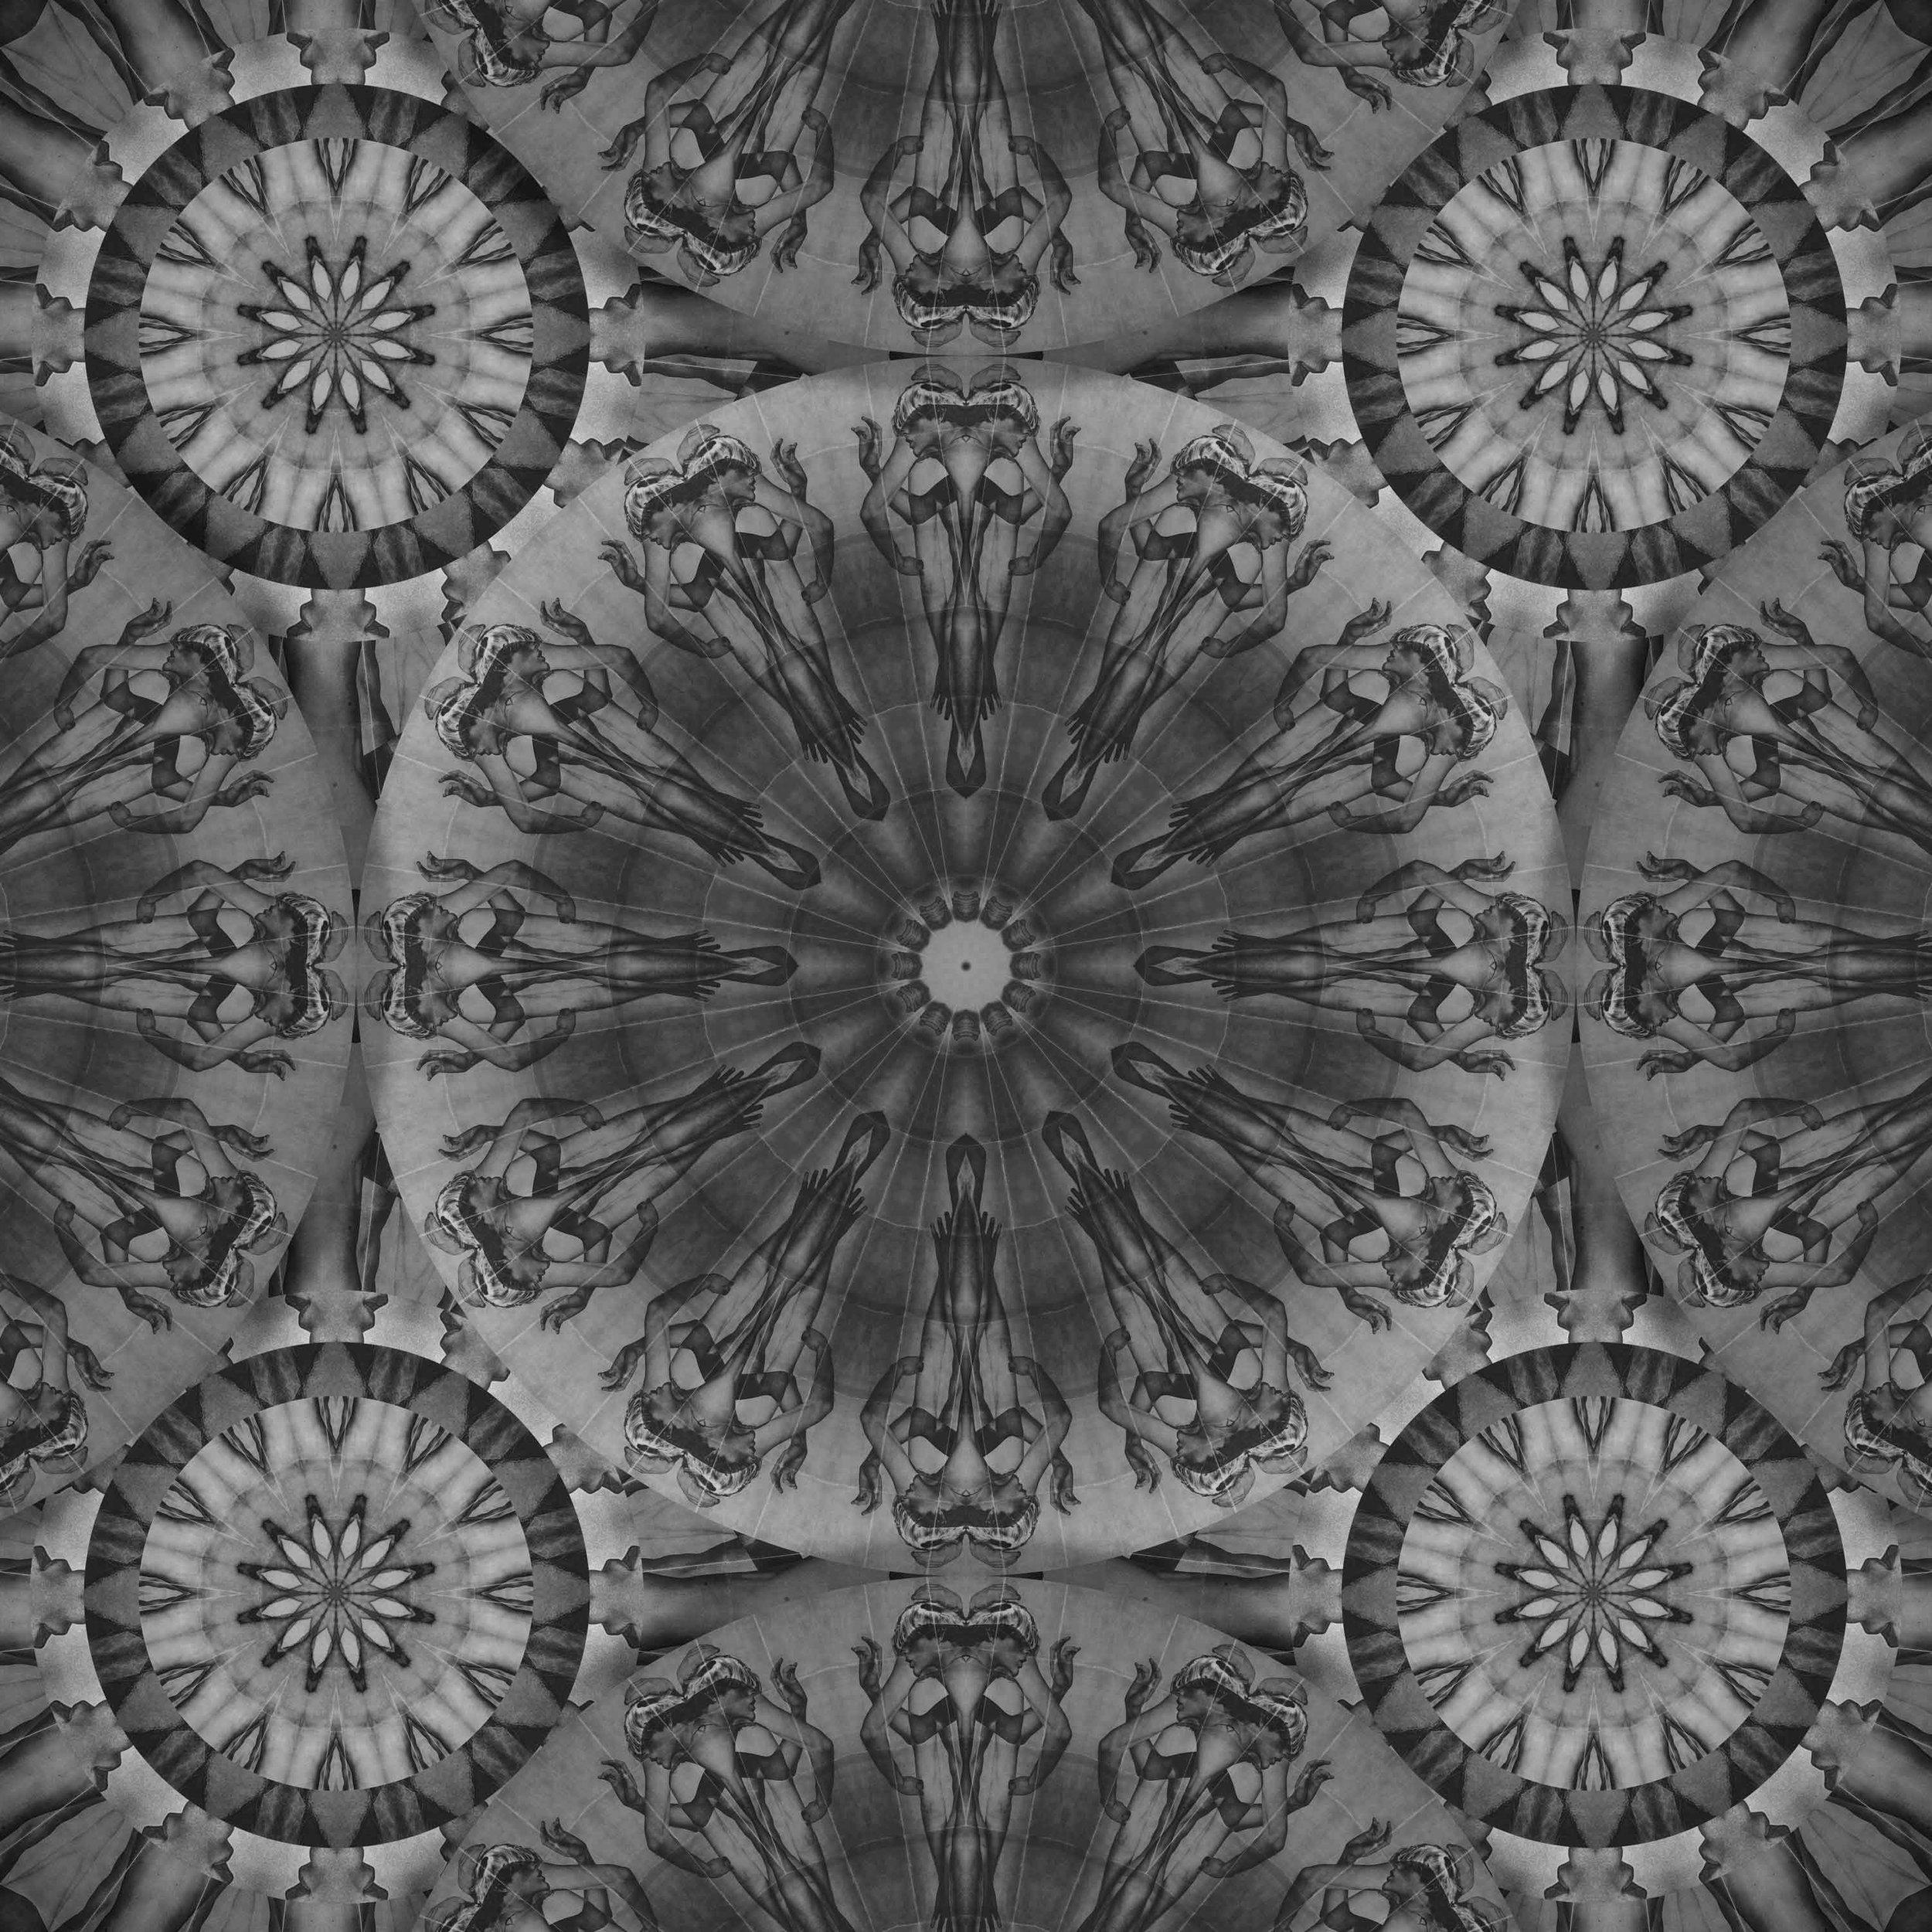 Large_Right_Mandala_70x70.jpg